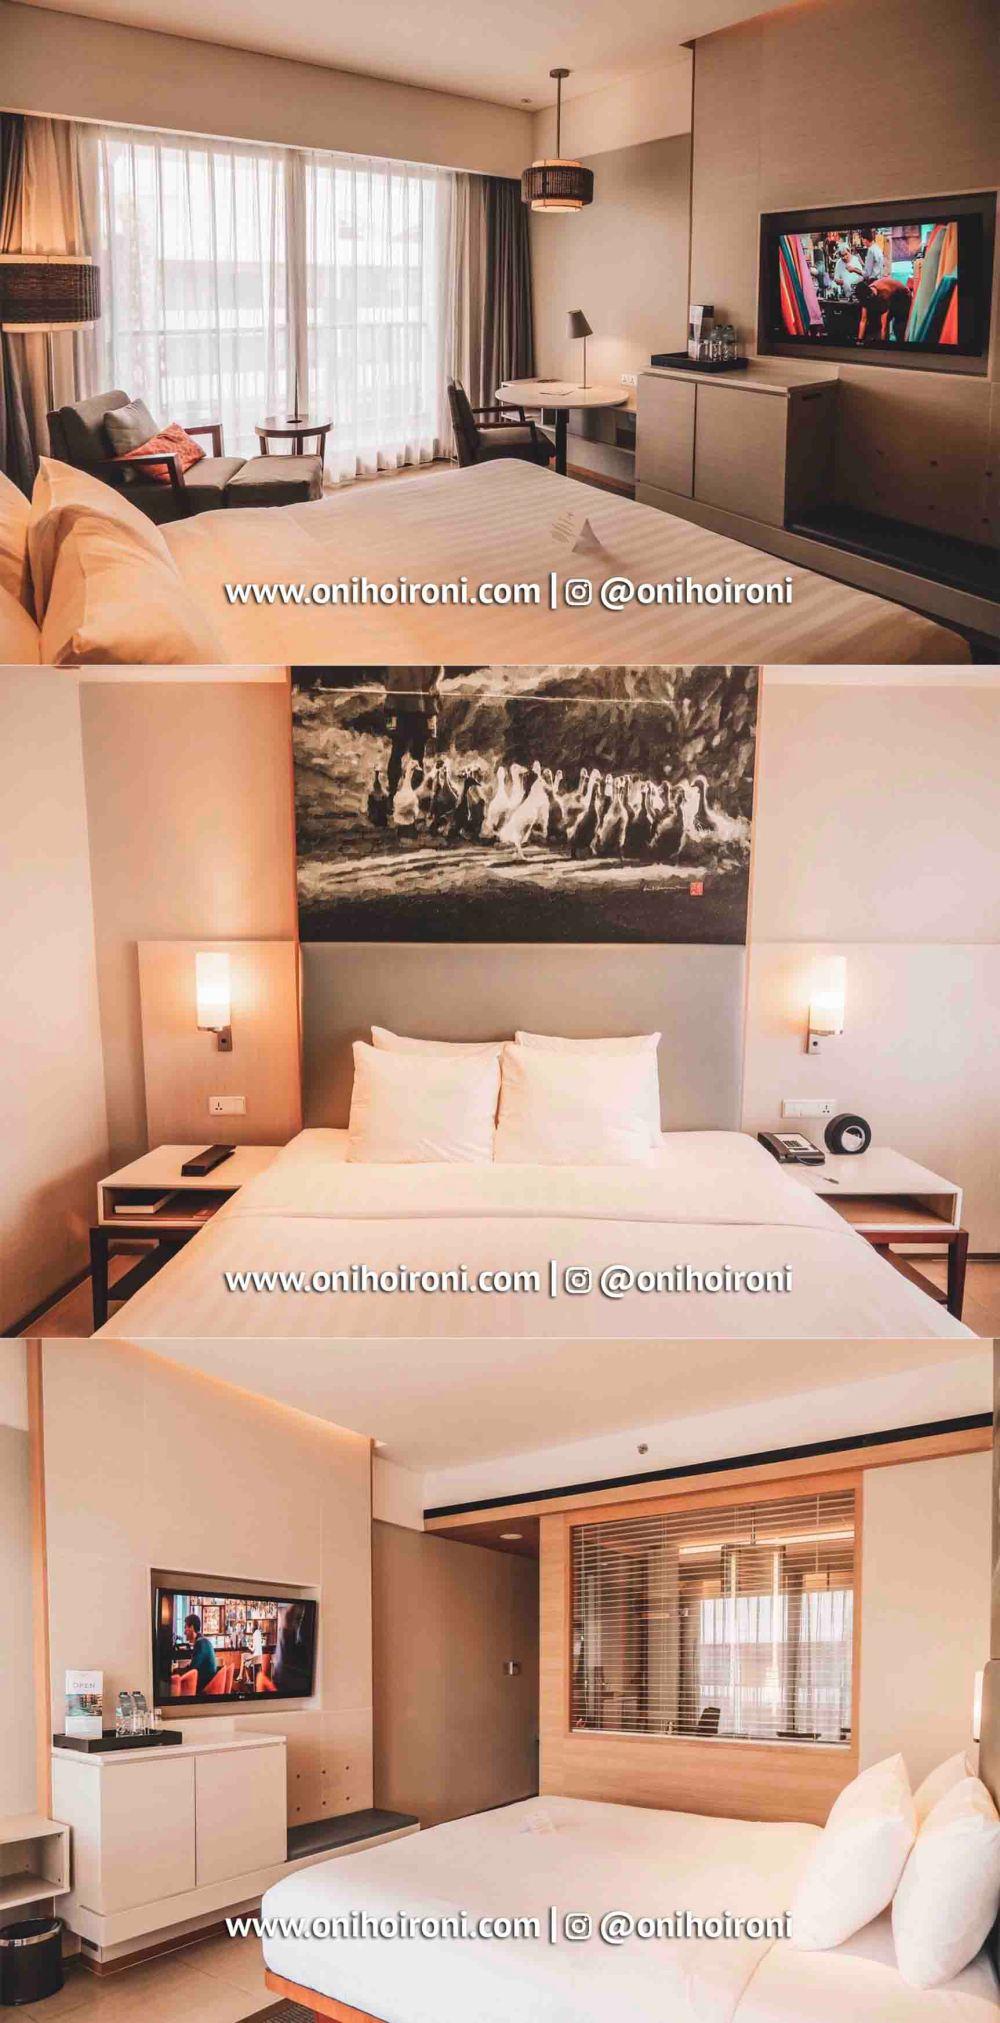 1 Room Courtyard Seminyak Bali .jpg